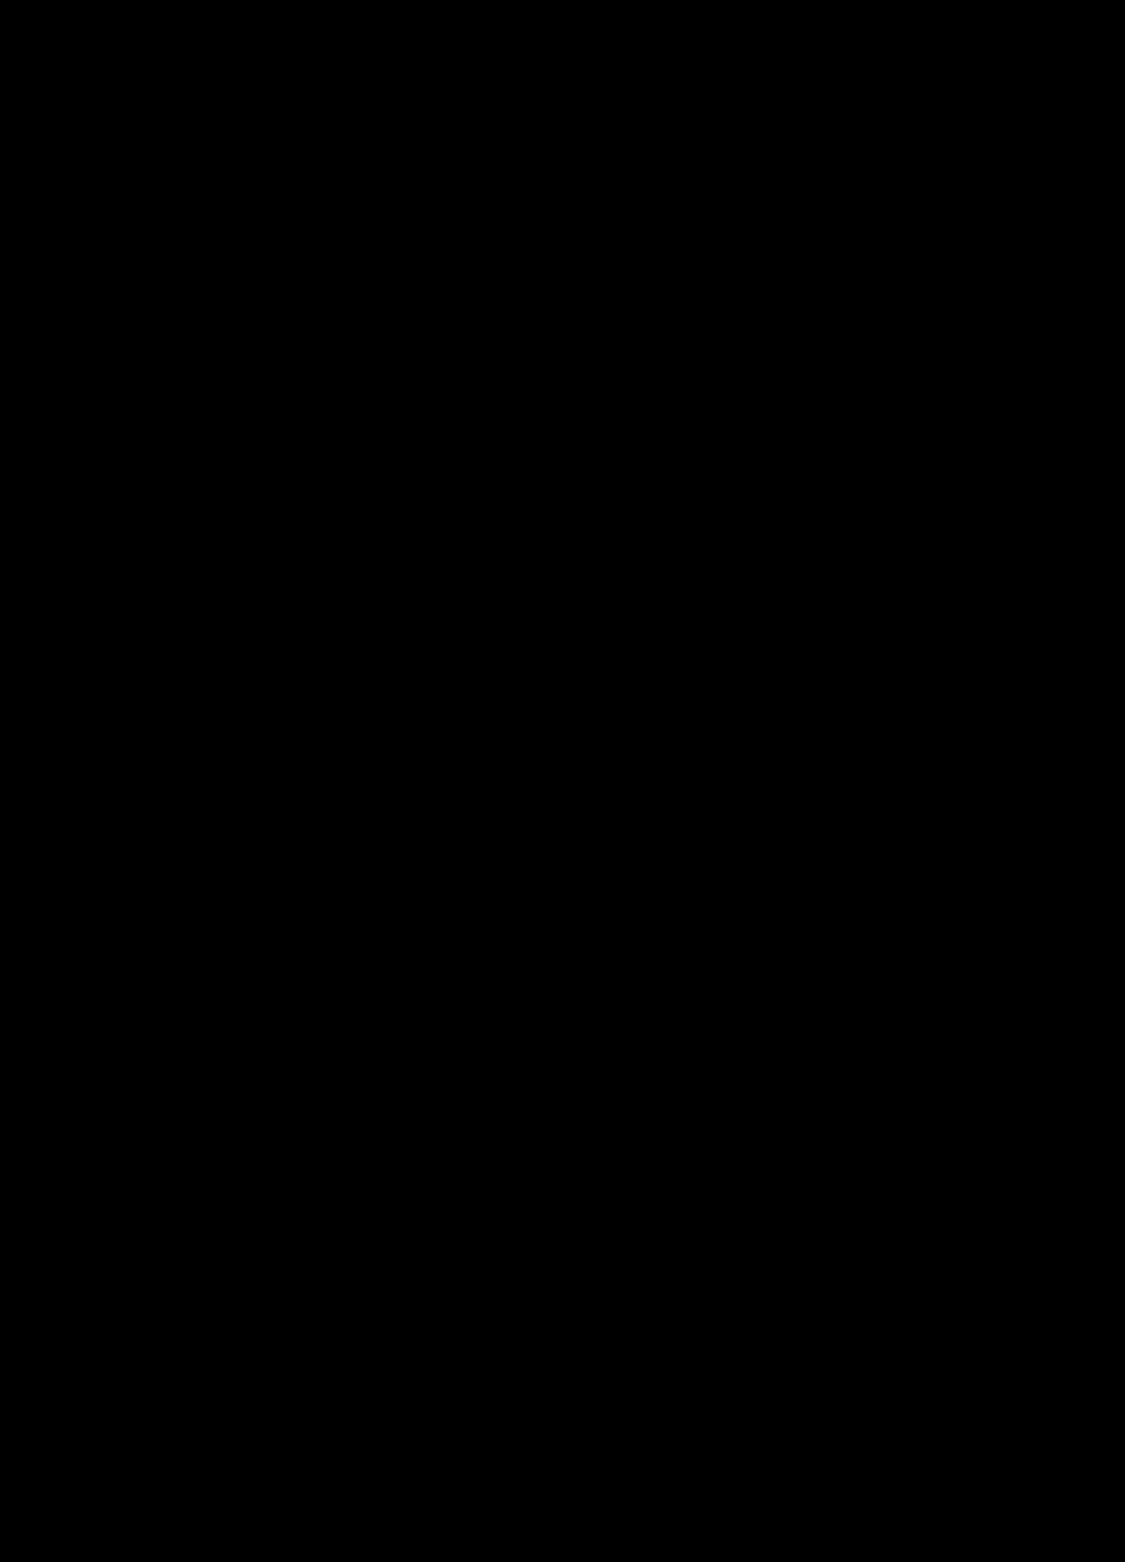 White V Neck Top